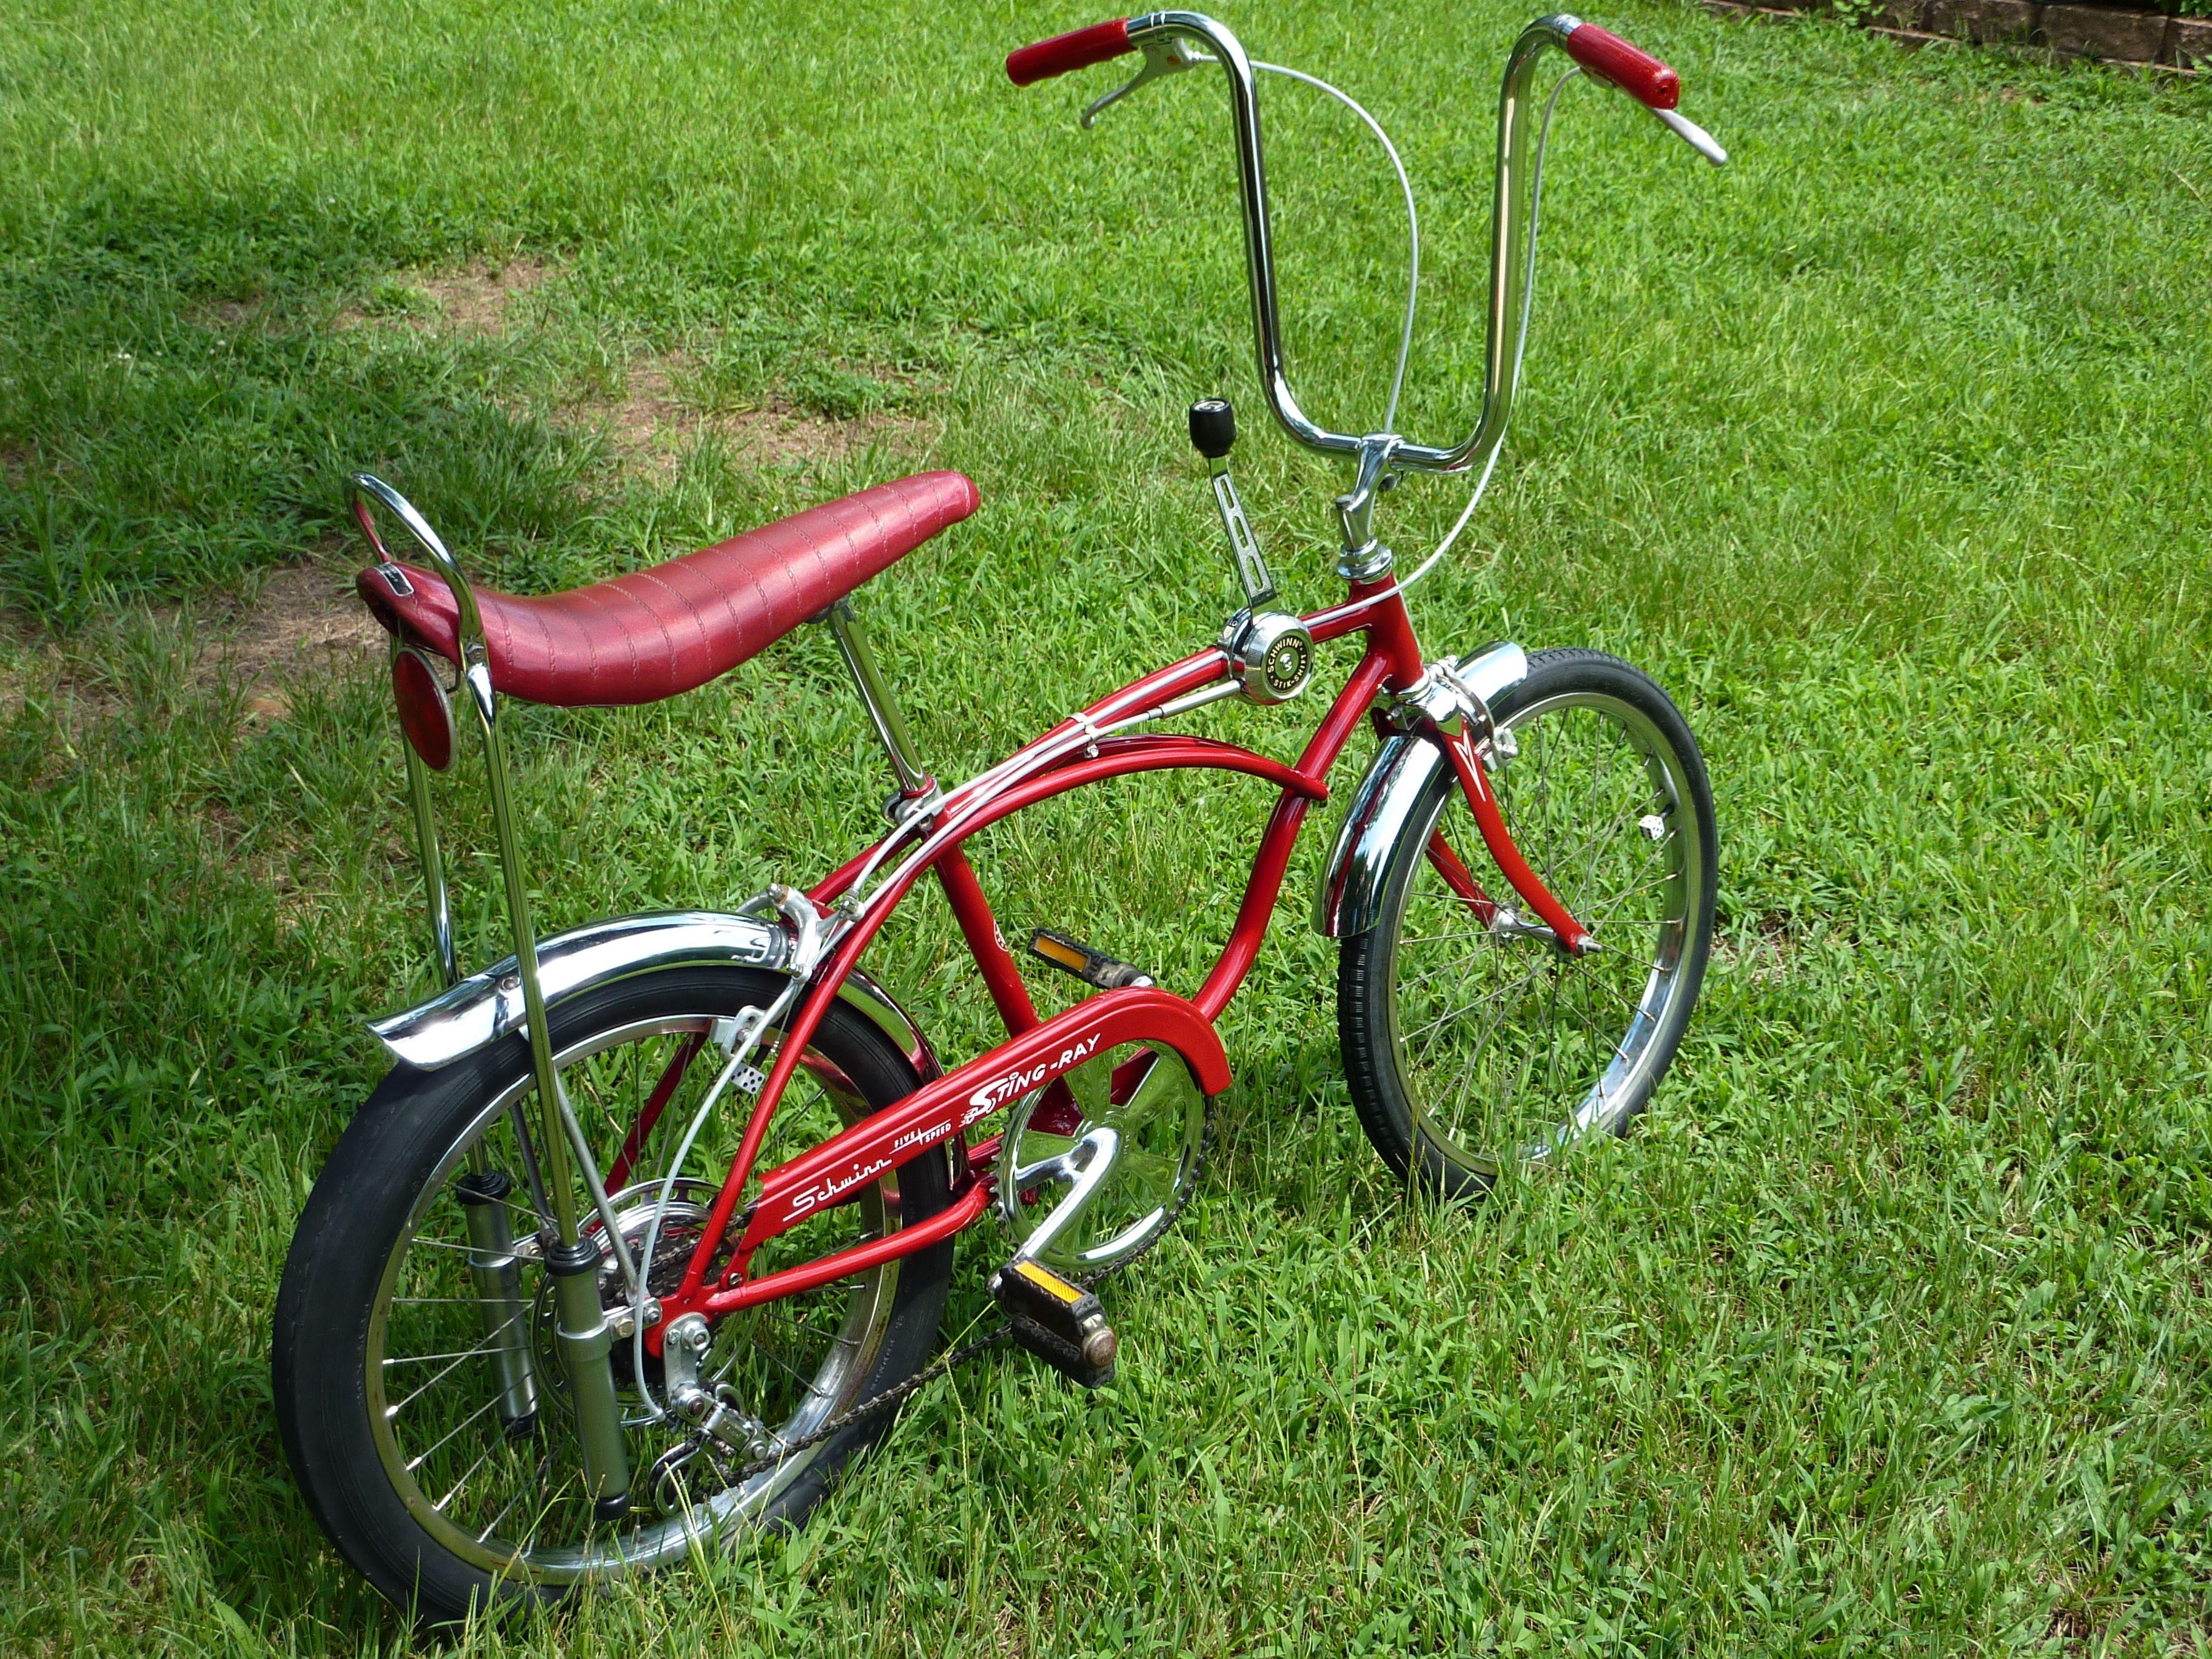 10c5f210e19 1975 Schwinn Stingray memories 101   keepitG   Vintage bikes ...